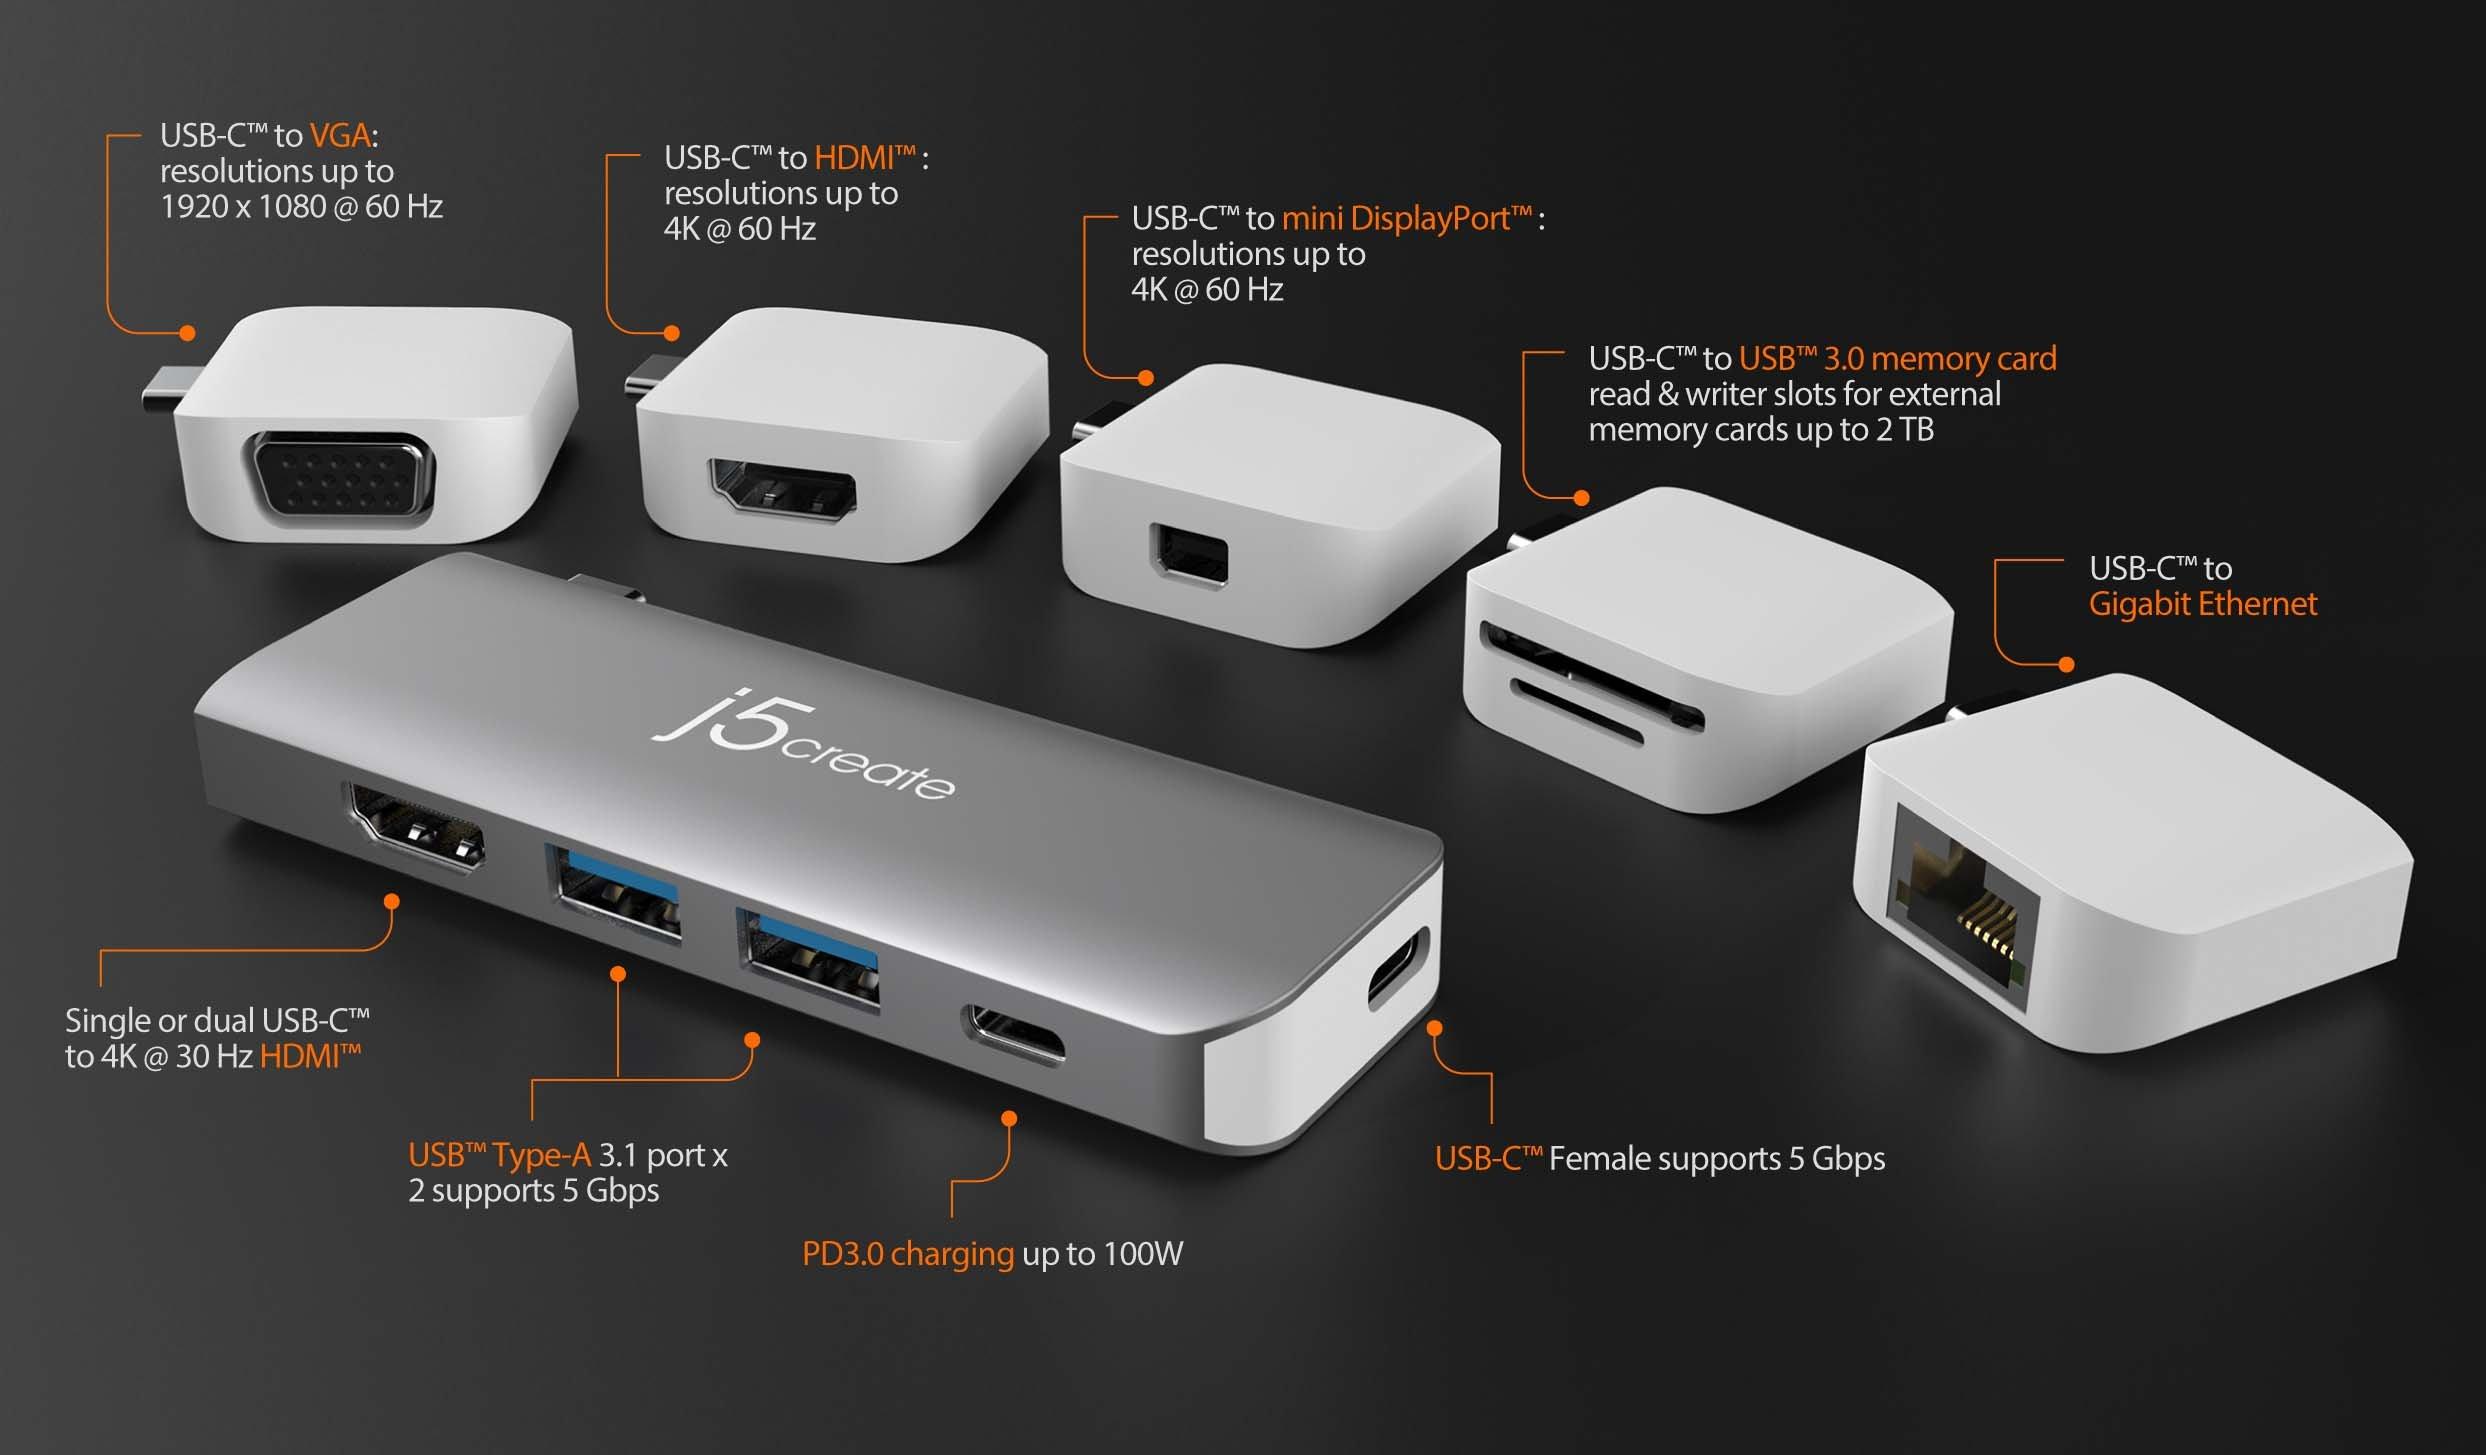 JCD389 è il dock USB-C multiporta trasformista di j5create